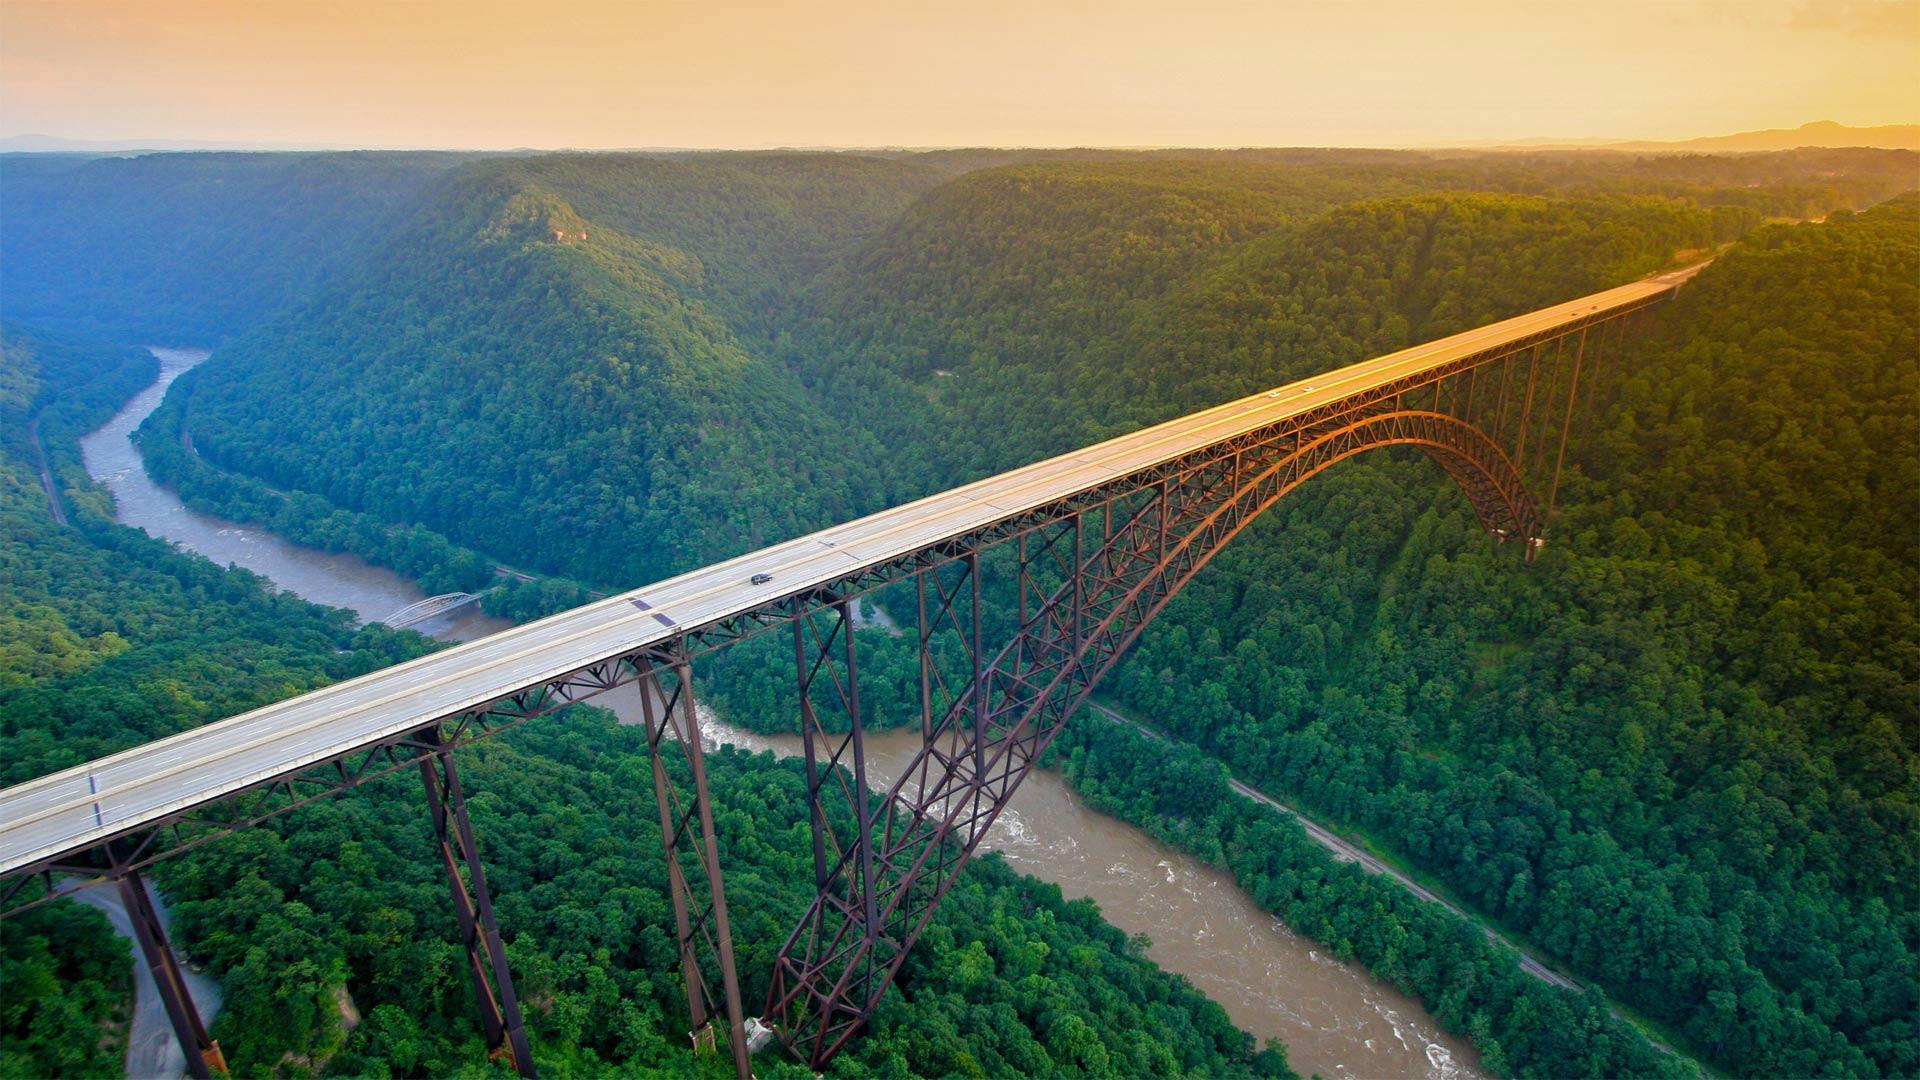 新河峡国家公园中的新河峡大桥,西弗吉尼亚州 (© Entropy Workshop/iStock/Getty Images Plus)